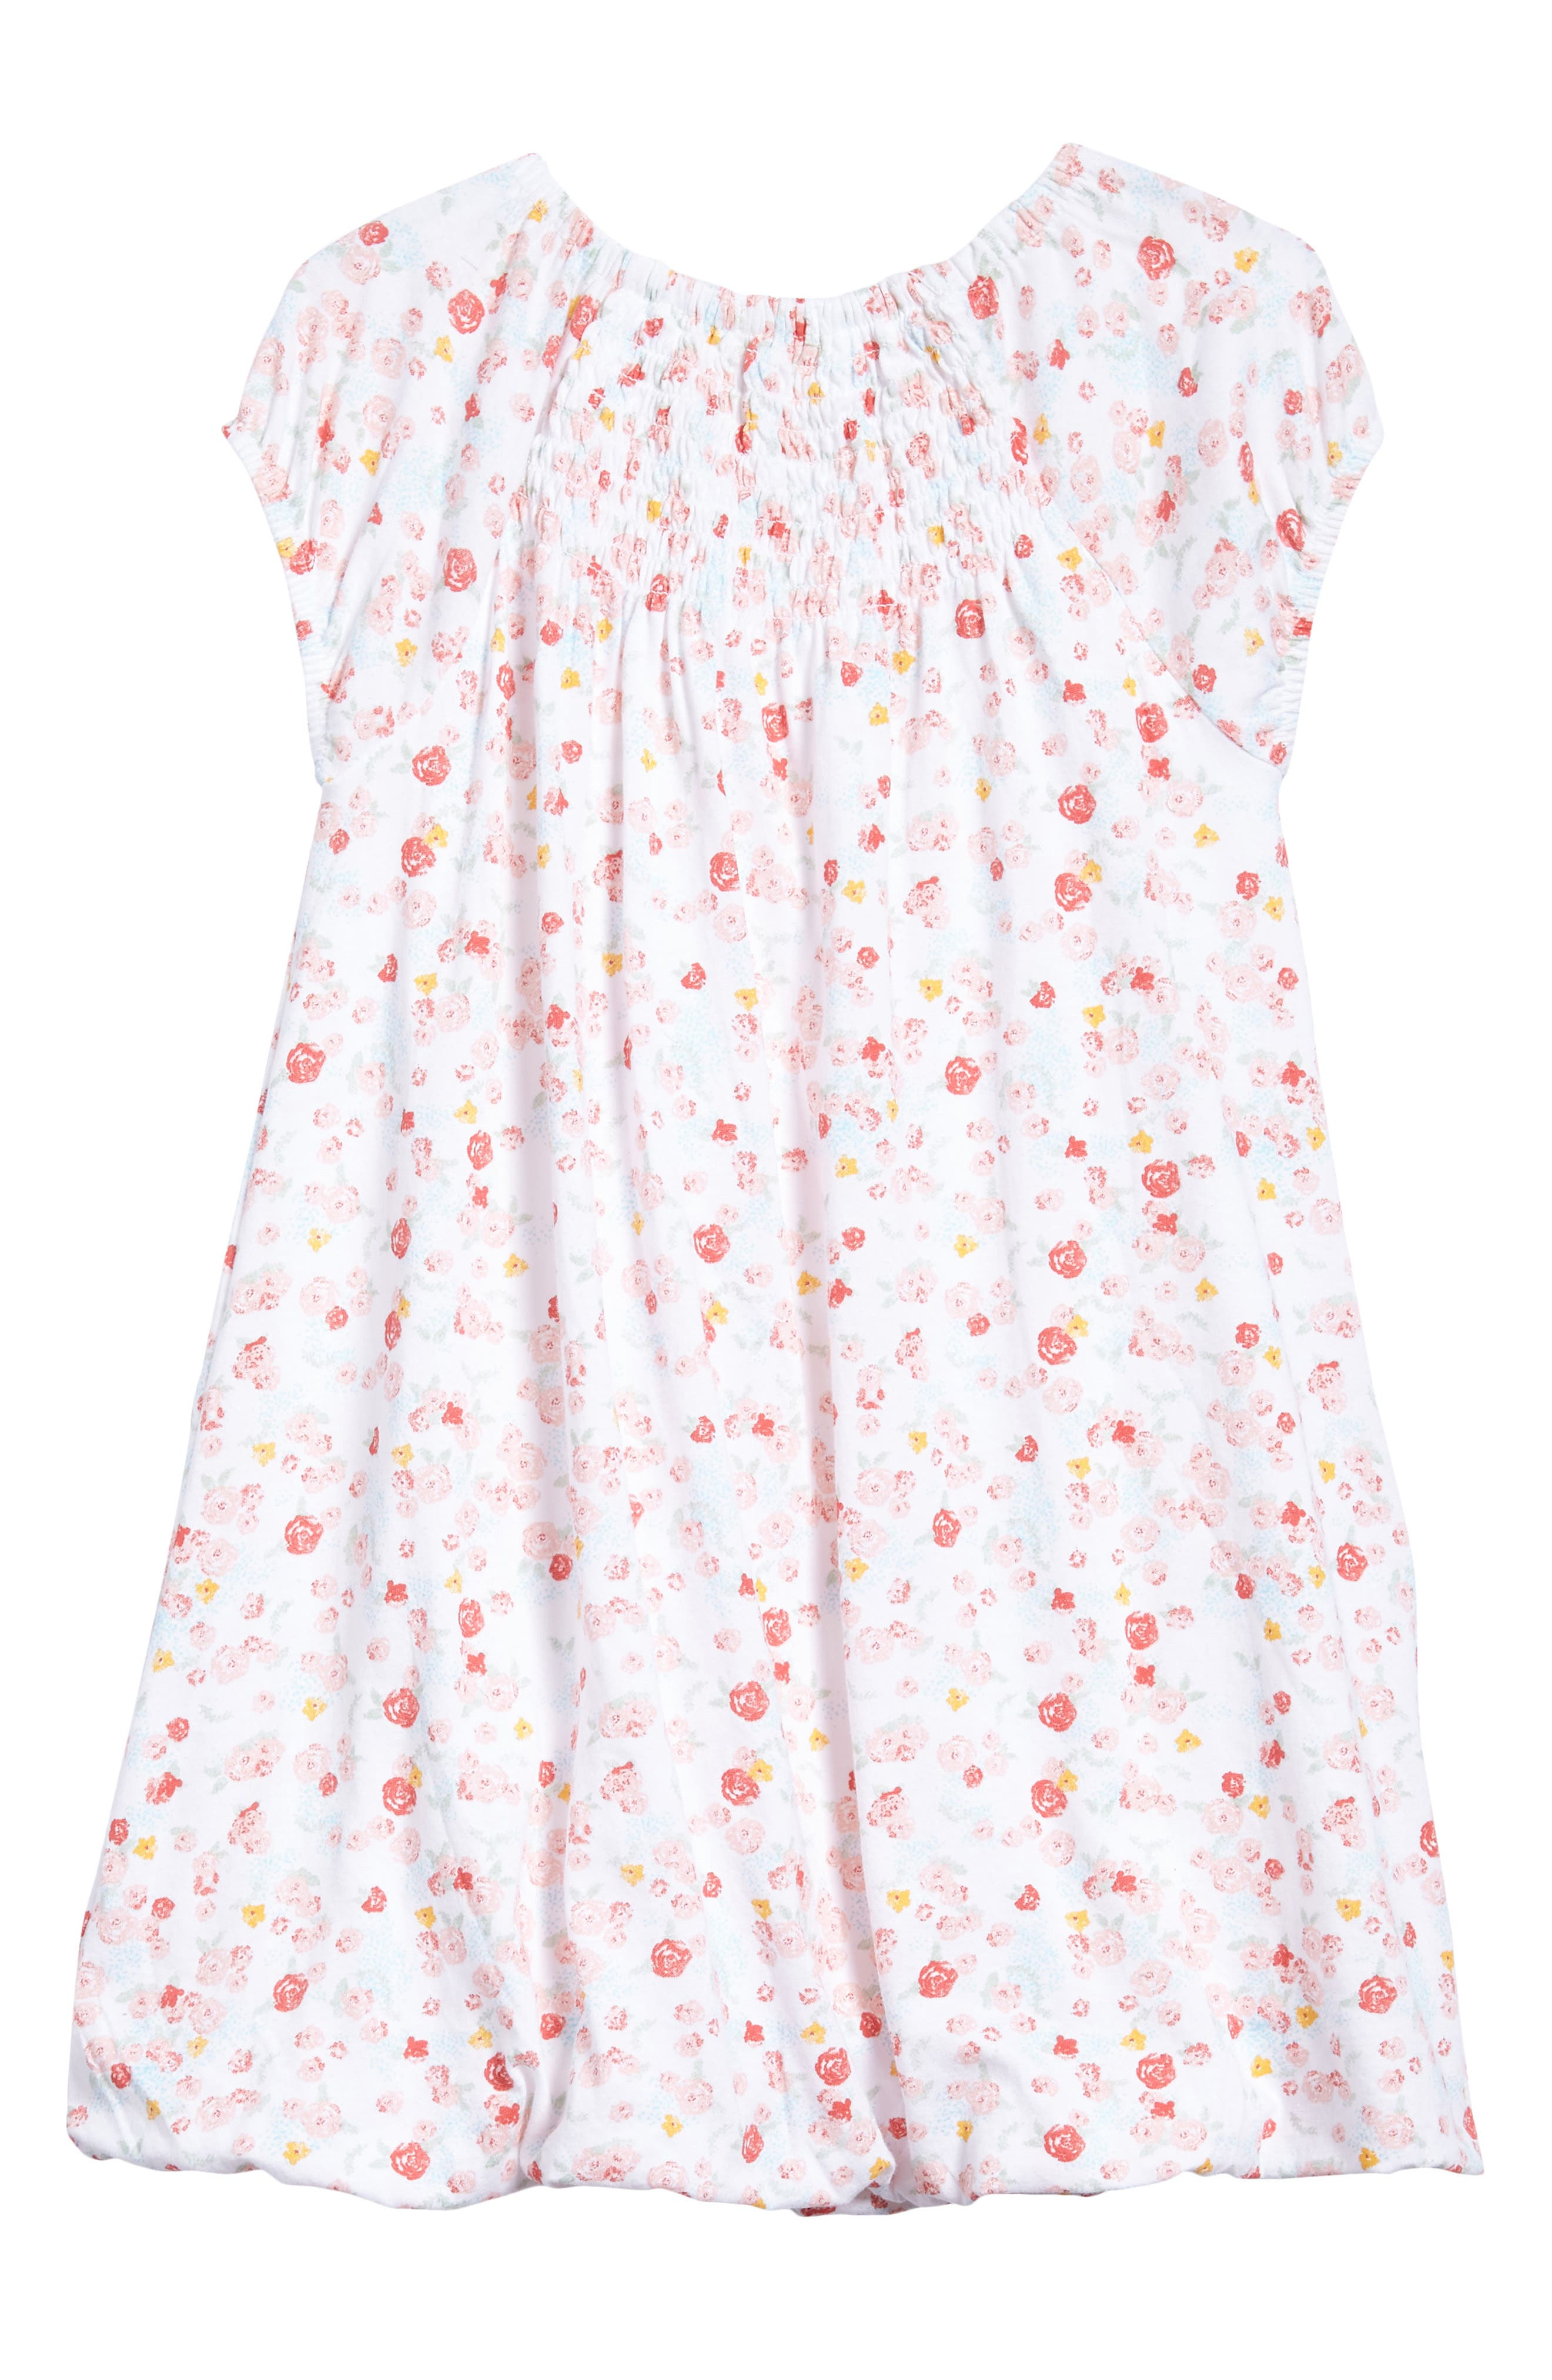 Ditsy Floral Print Bubble Dress,                             Alternate thumbnail 2, color,